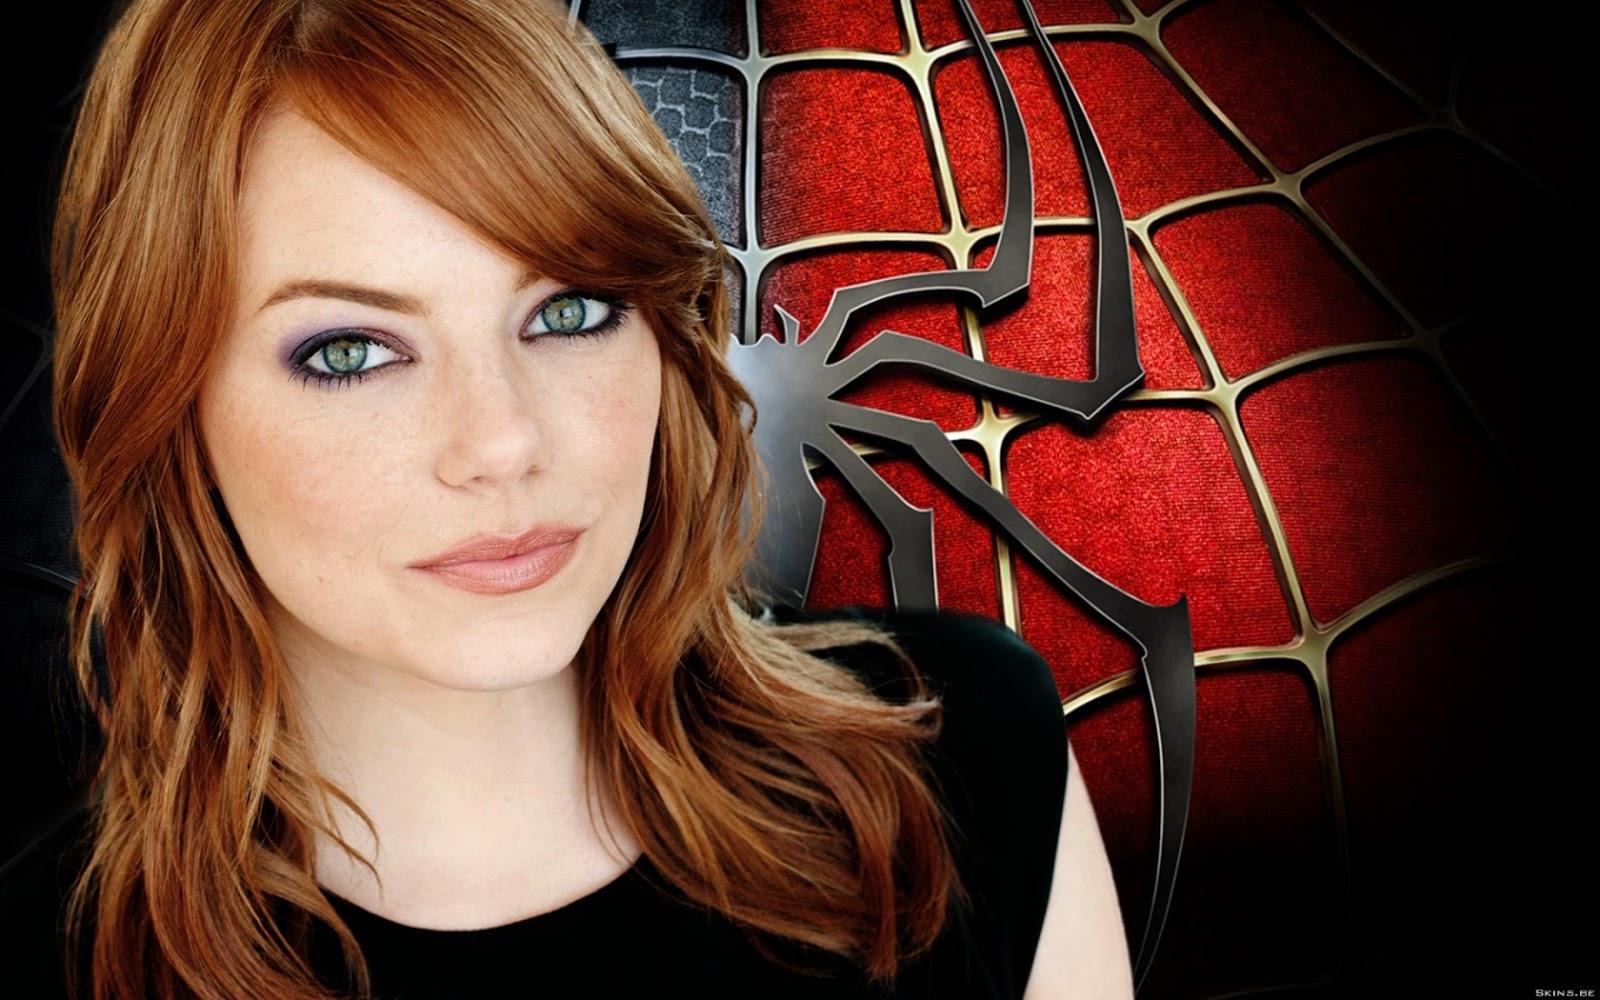 http://1.bp.blogspot.com/-GzODUV3eZz0/UMx_LTyx-uI/AAAAAAAAnR8/OG1tHfbB9r4/s1600/Emma-Stone-spiderman.jpg